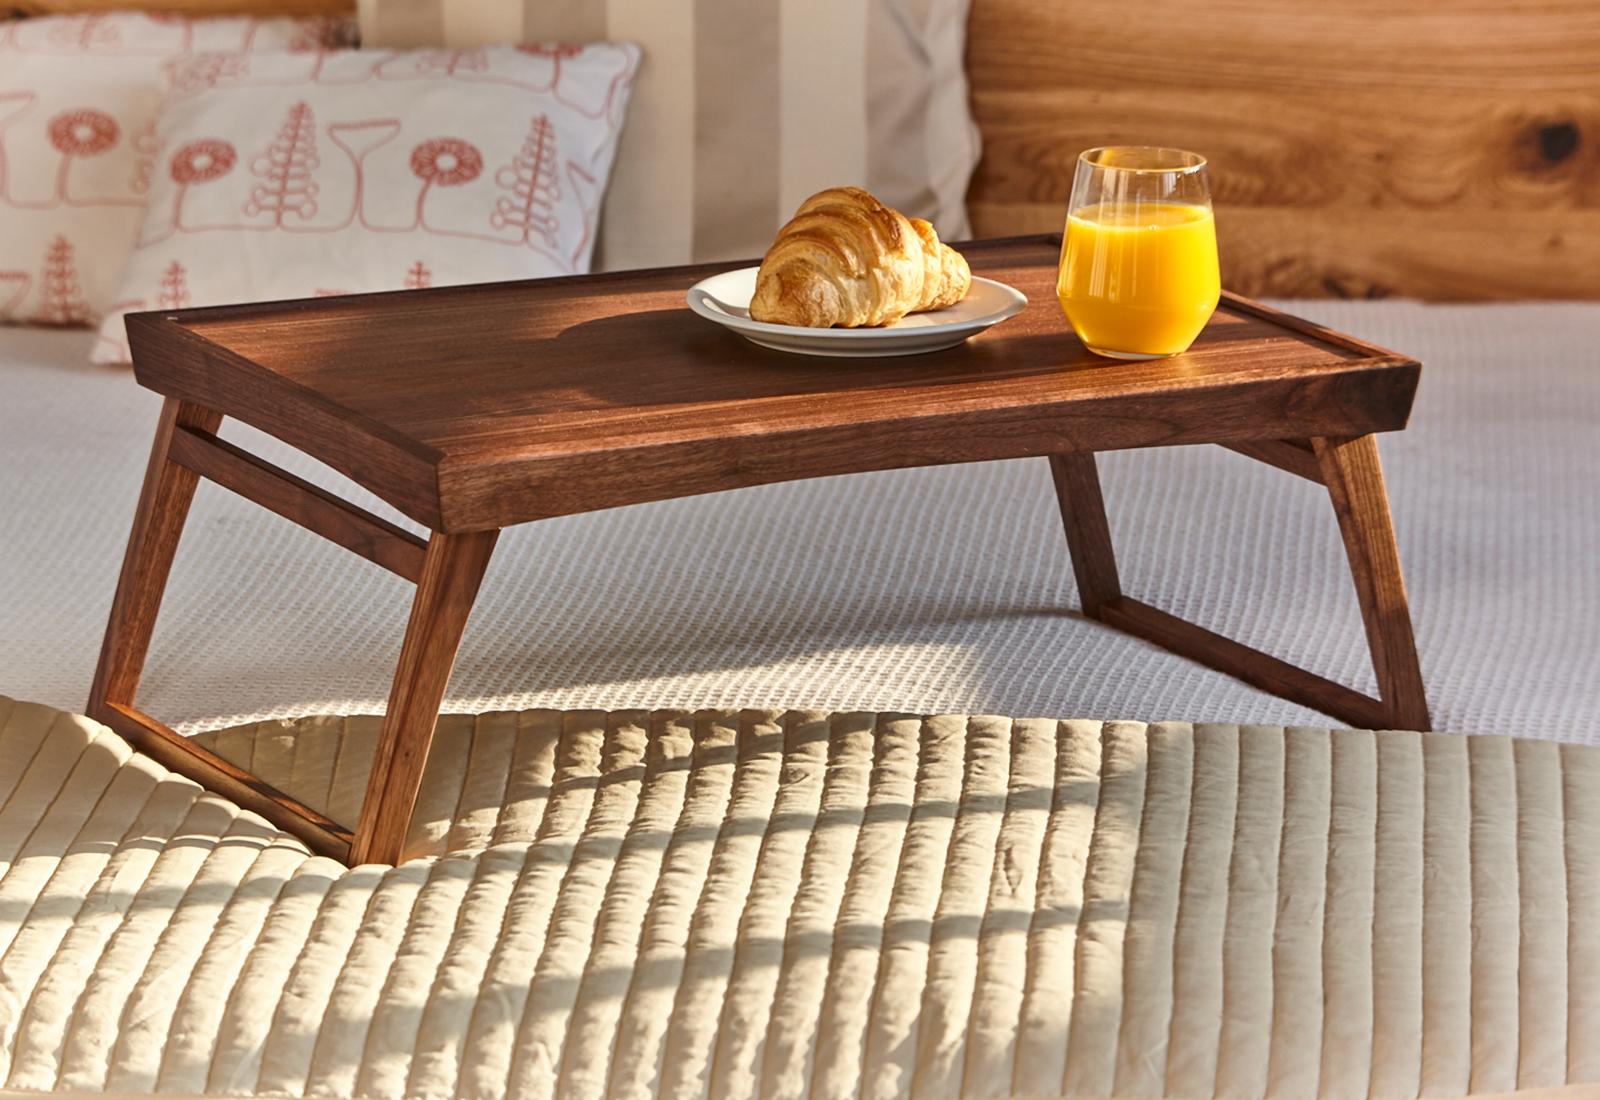 DÉSIRÉE bed tray table